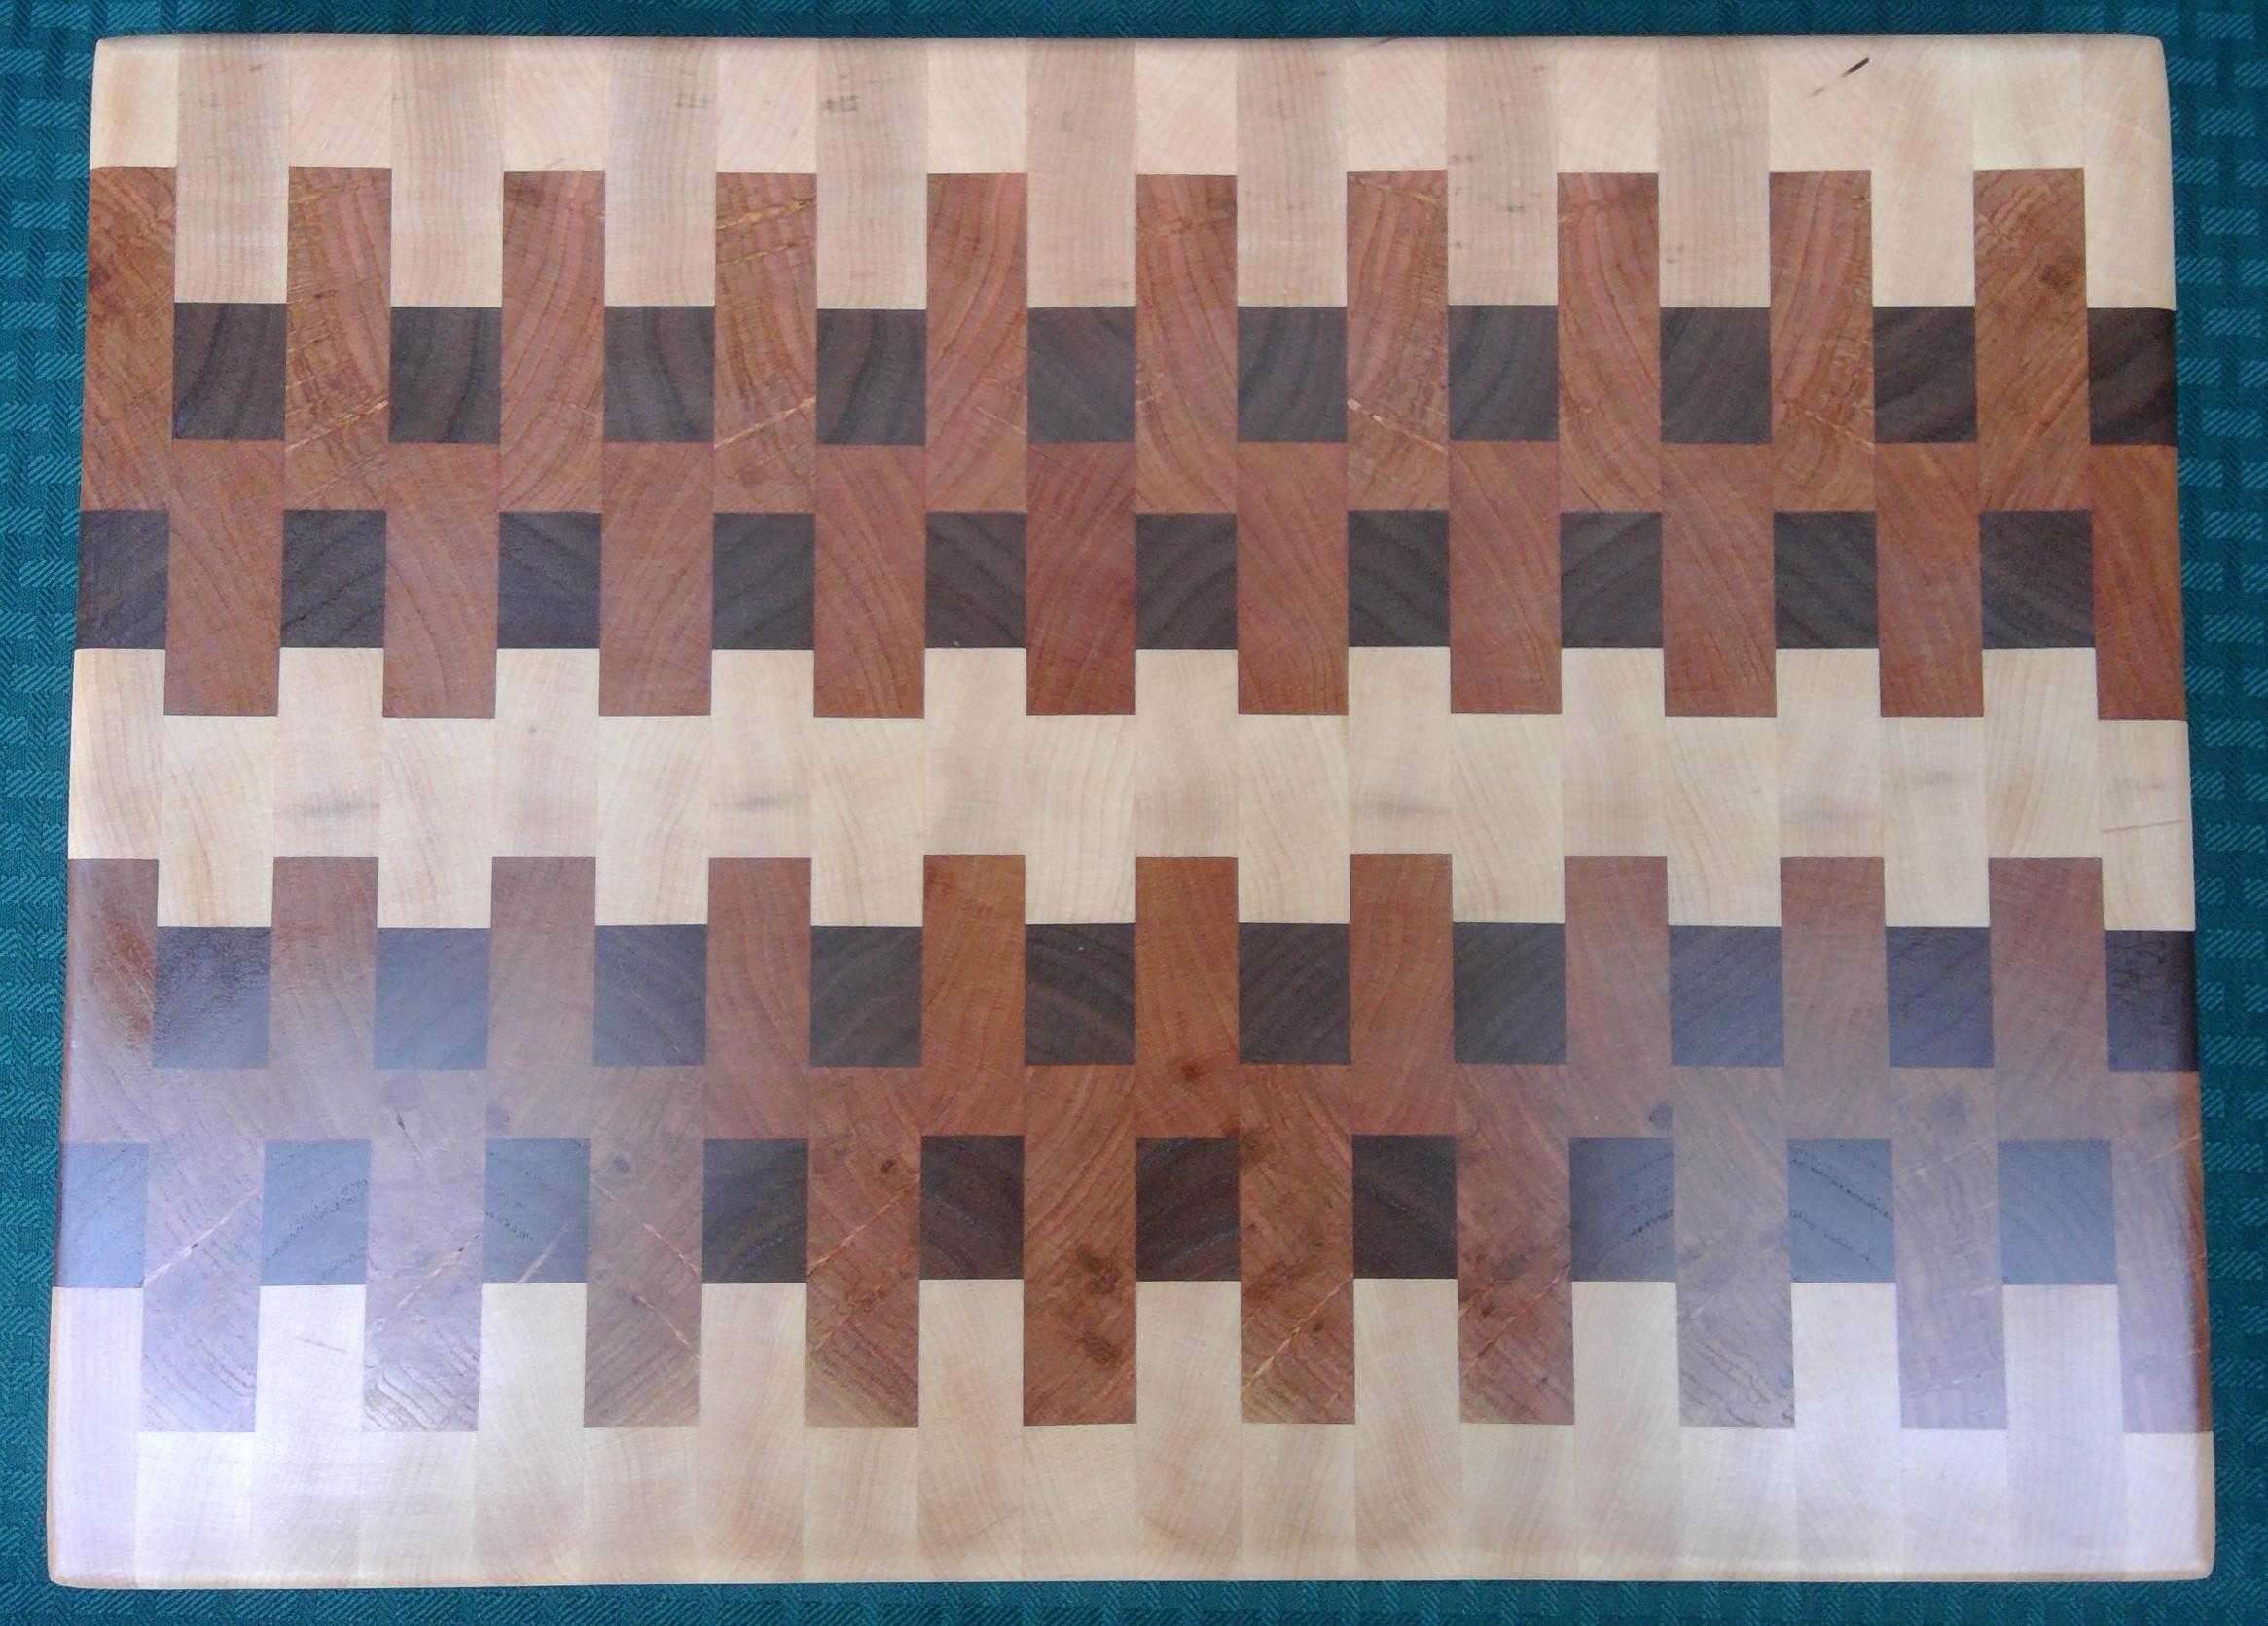 Cutting Board in Walnut, Maple and Cherry